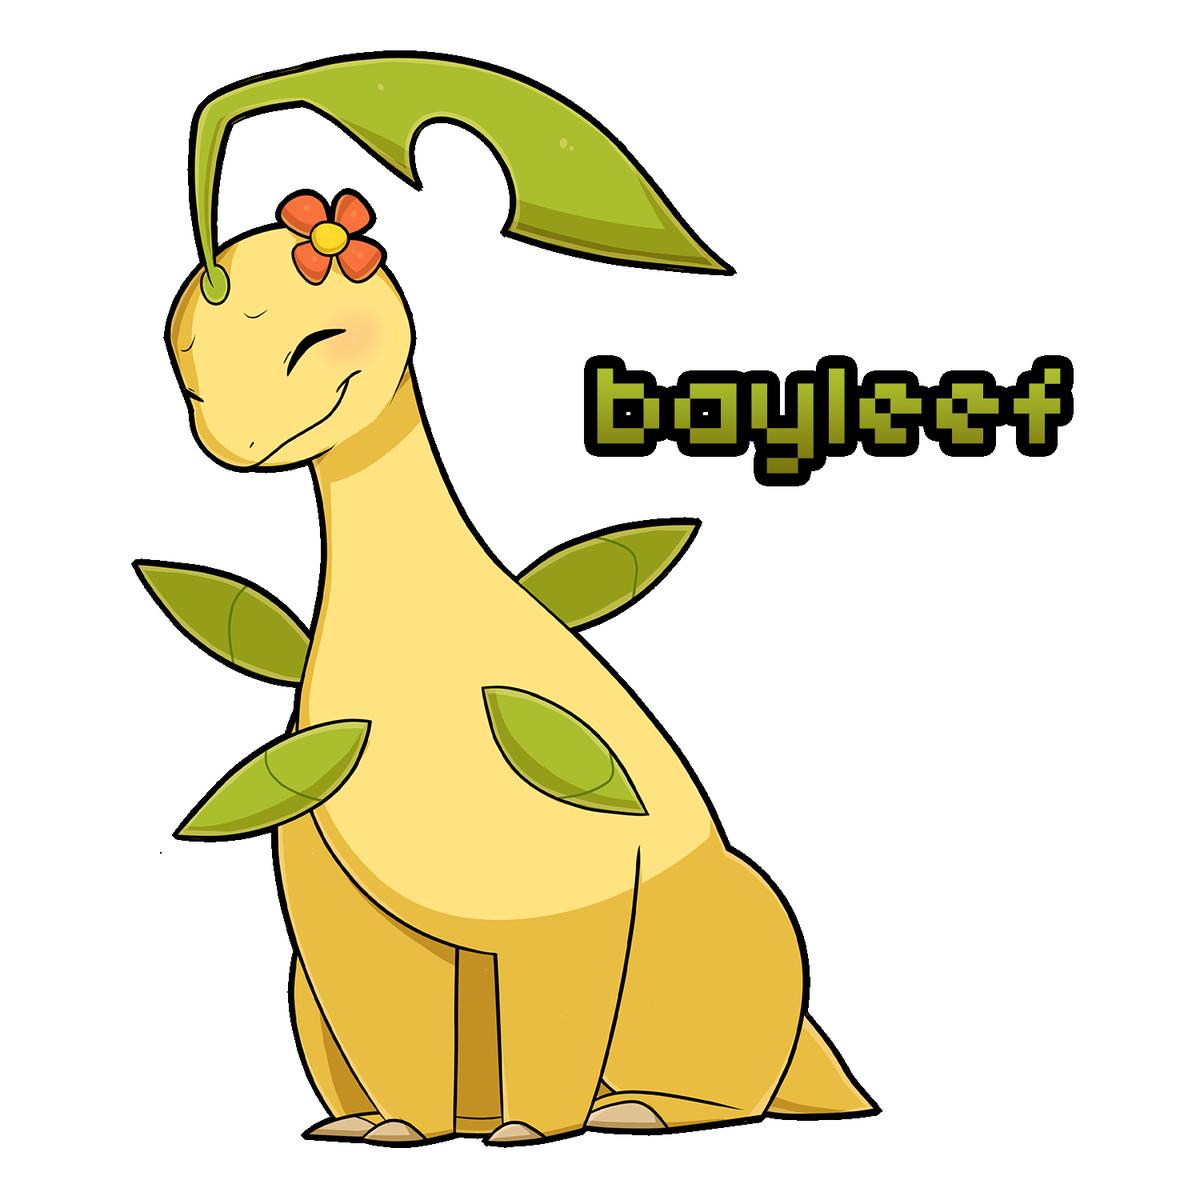 bayleef hashtag on twitter